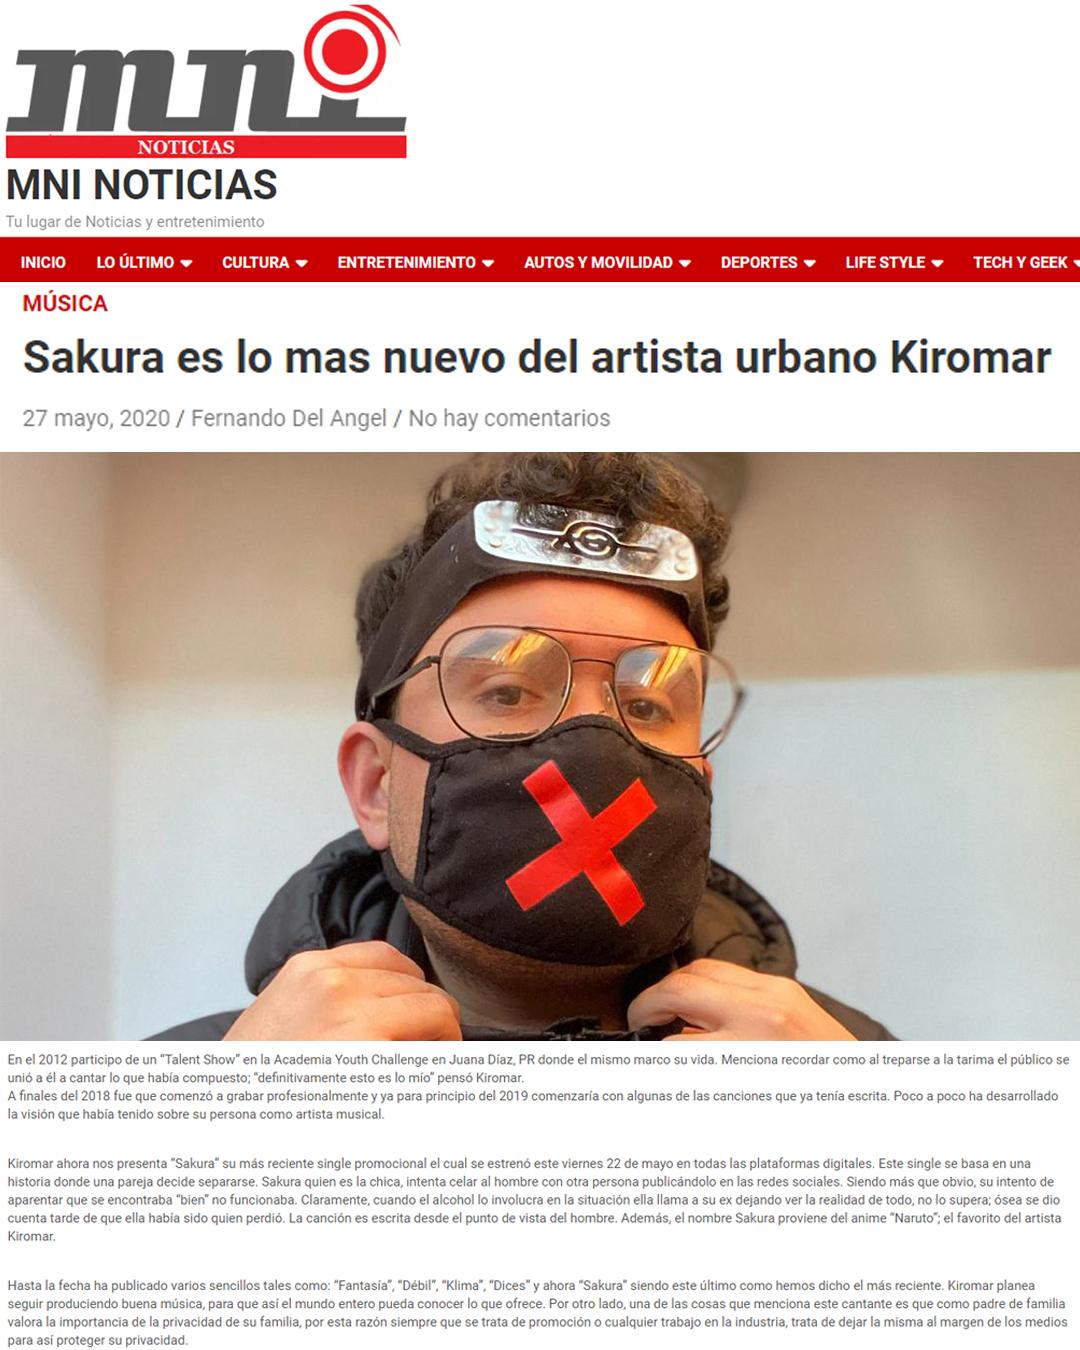 MNI NOTICIAS MEXICO